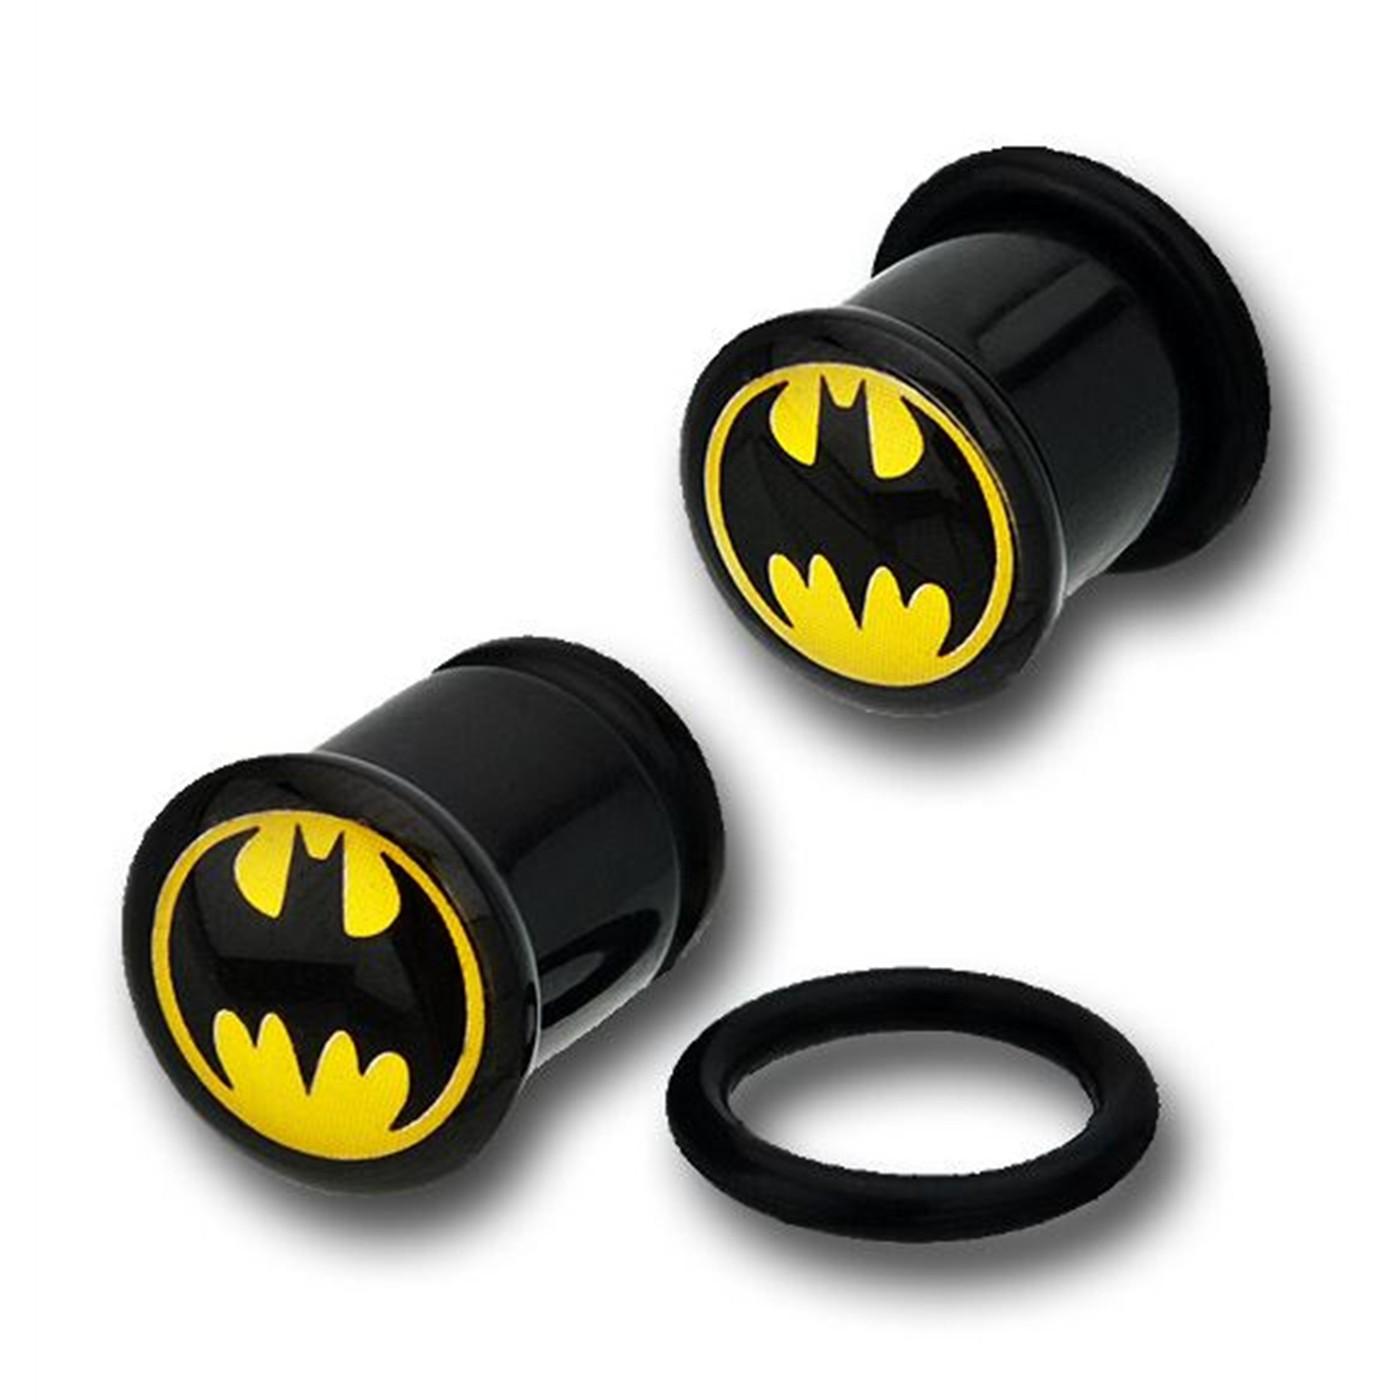 Batman Black Acrylic Single Flare Plugs